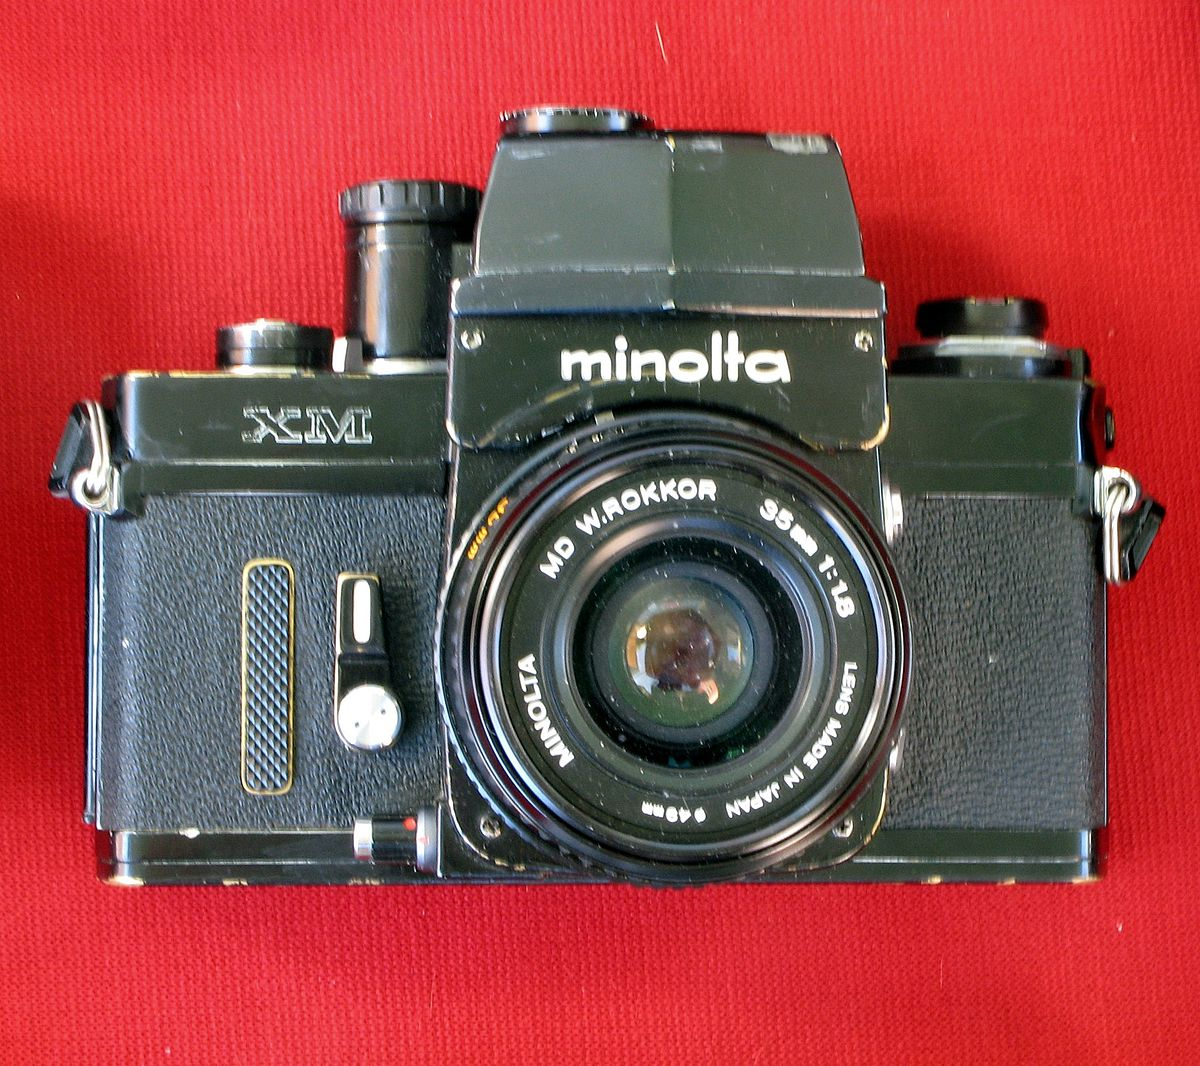 minolta x 1 wikipedia rh en wikipedia org Minolta XK Screen App Minolta Cameras XK